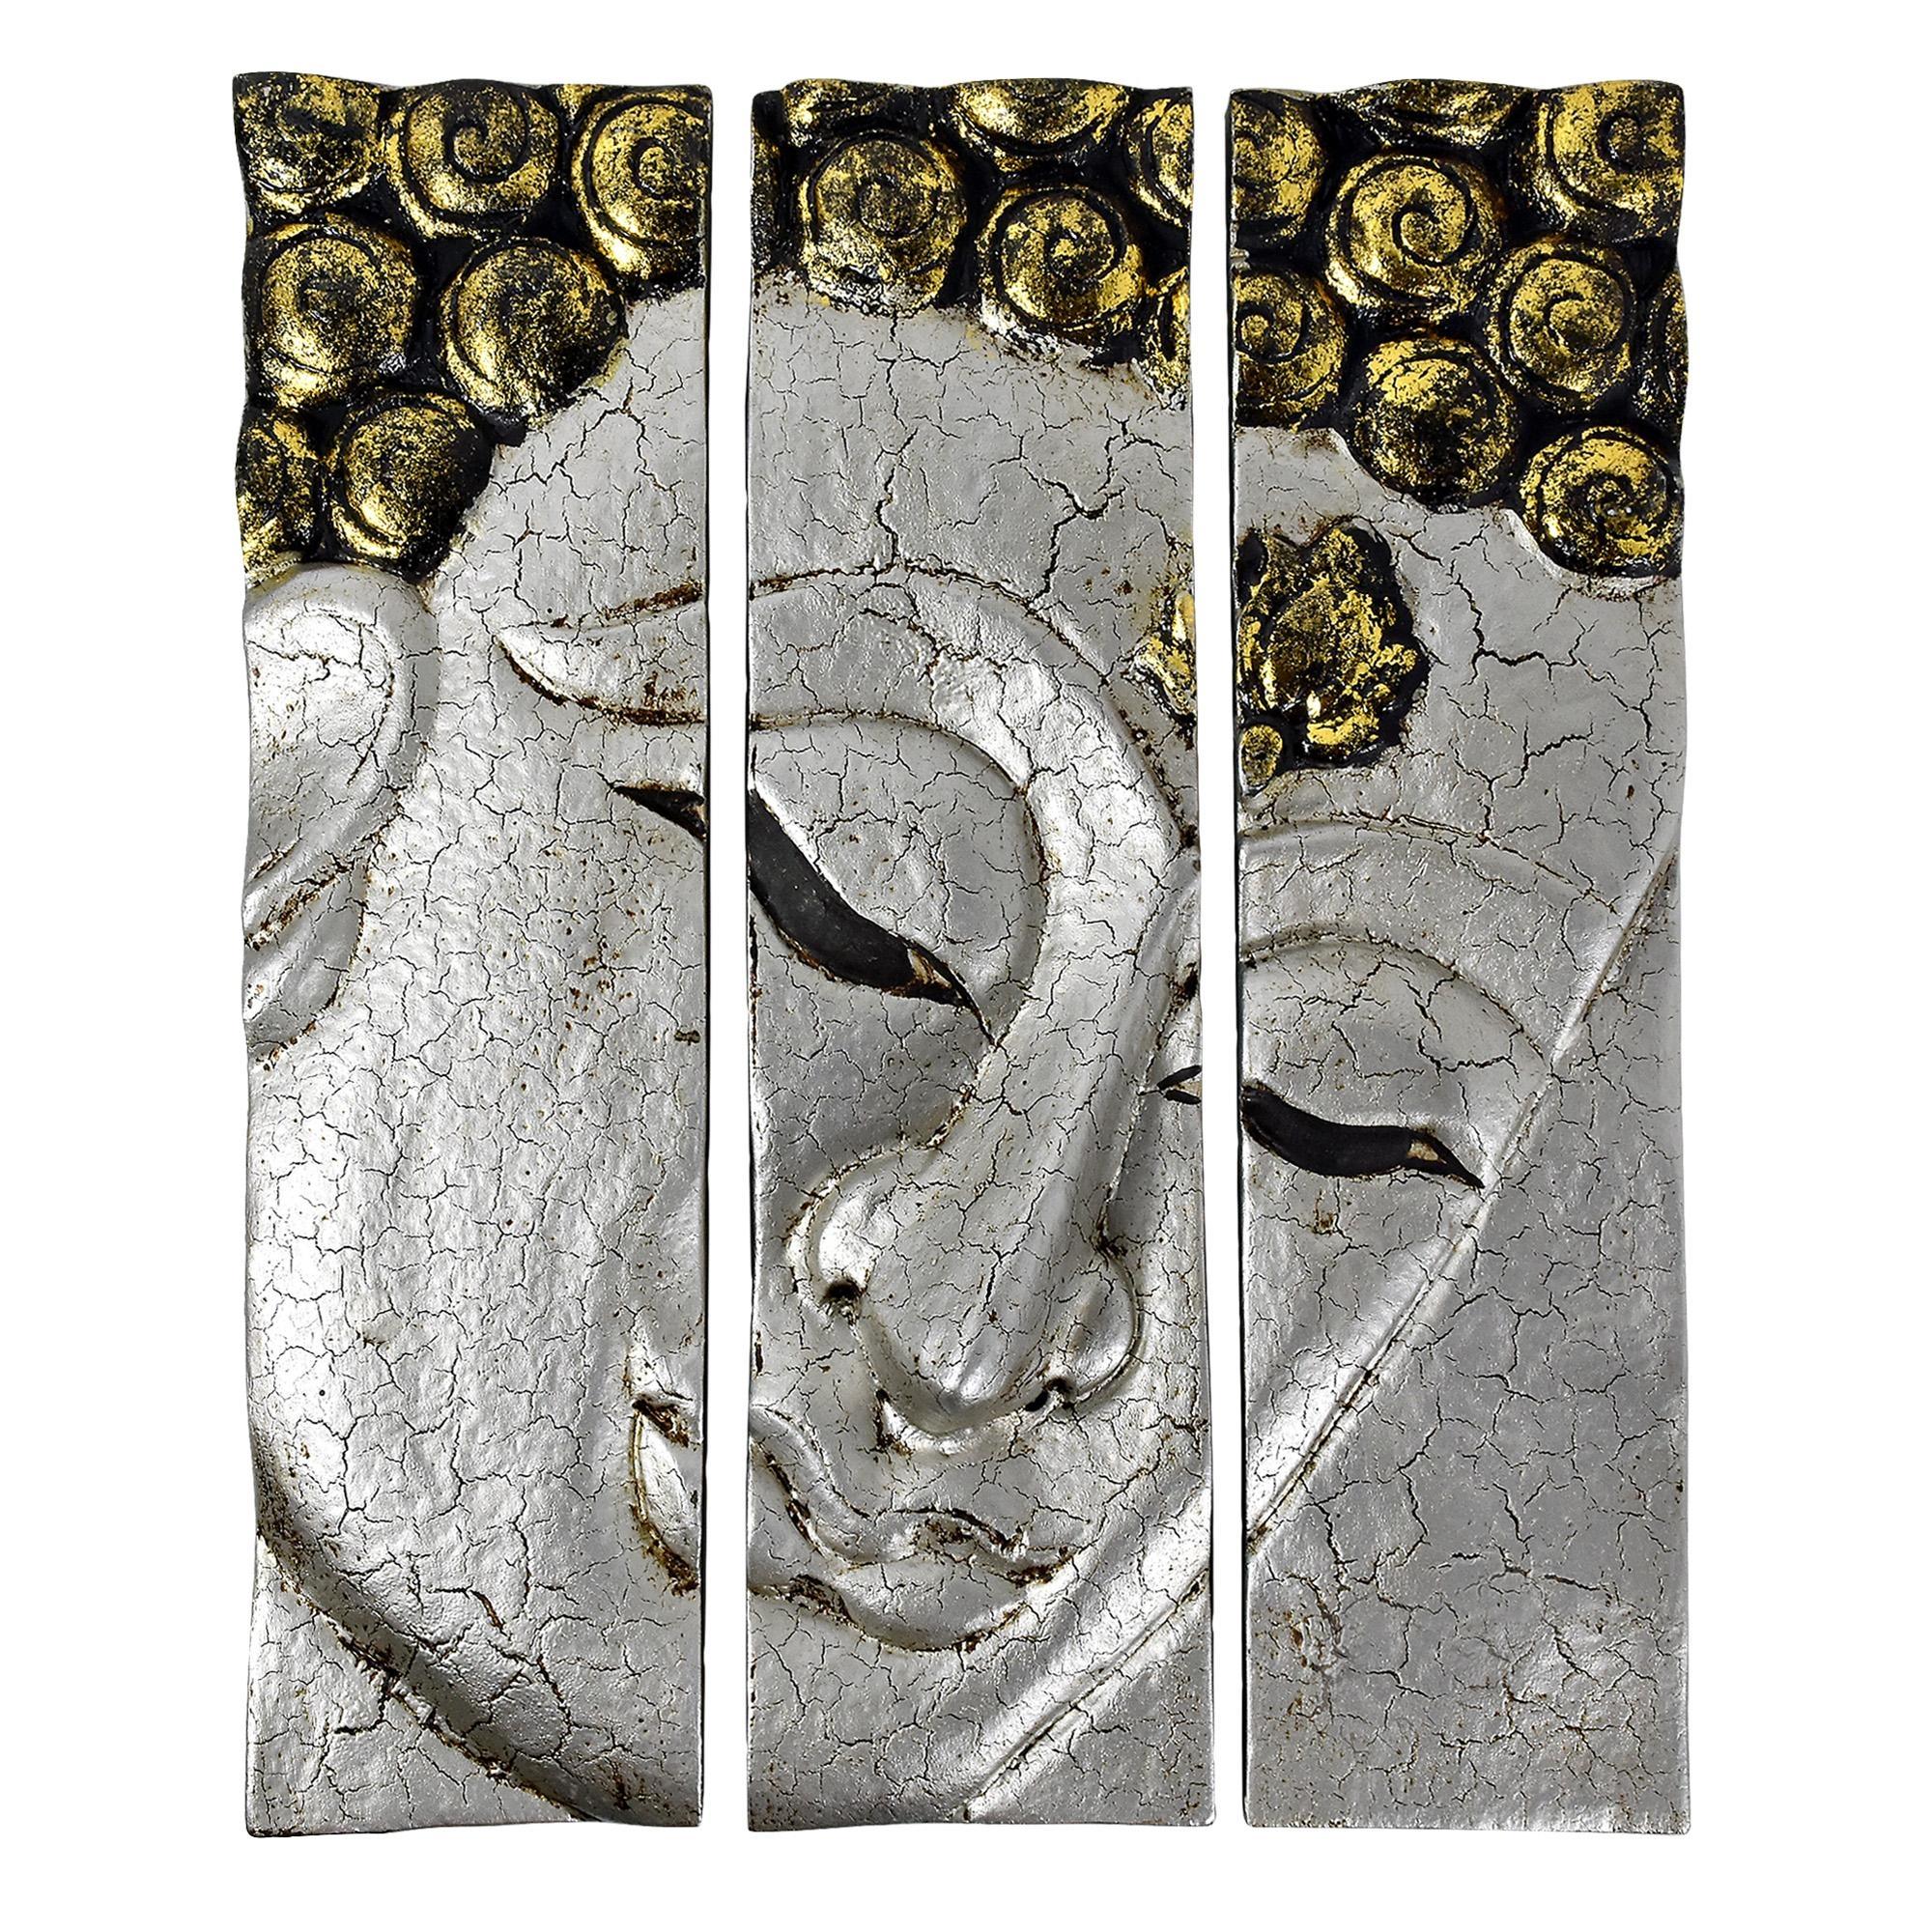 Silver Crackle Buddha Face Three Panel Hanging Handmade Wall Art Regarding Buddha Wood Wall Art (Image 10 of 20)